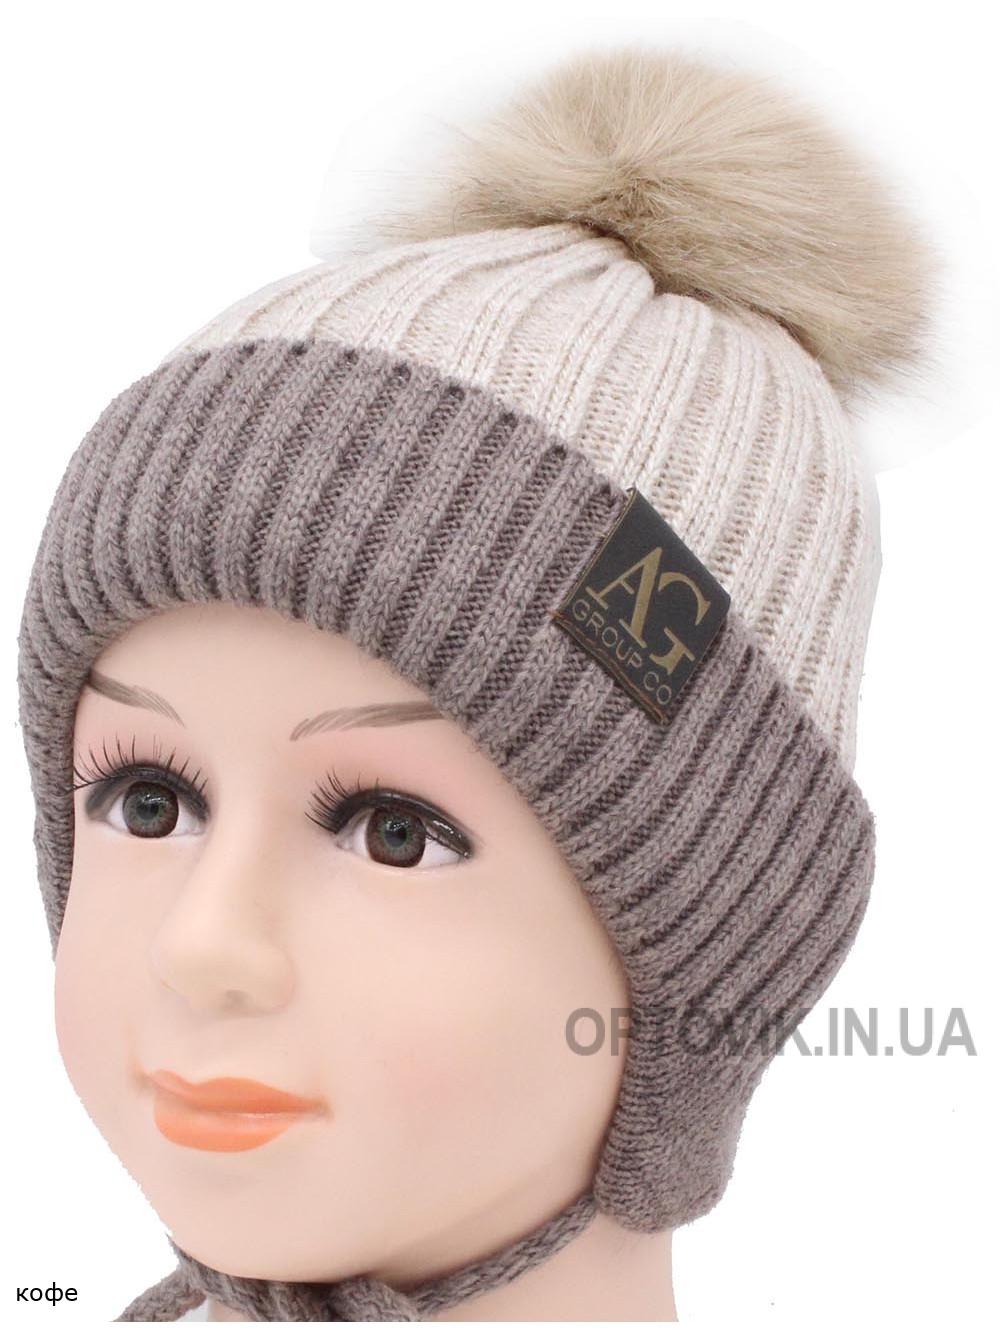 Детская вязаная шапка Томас D51032-46-50